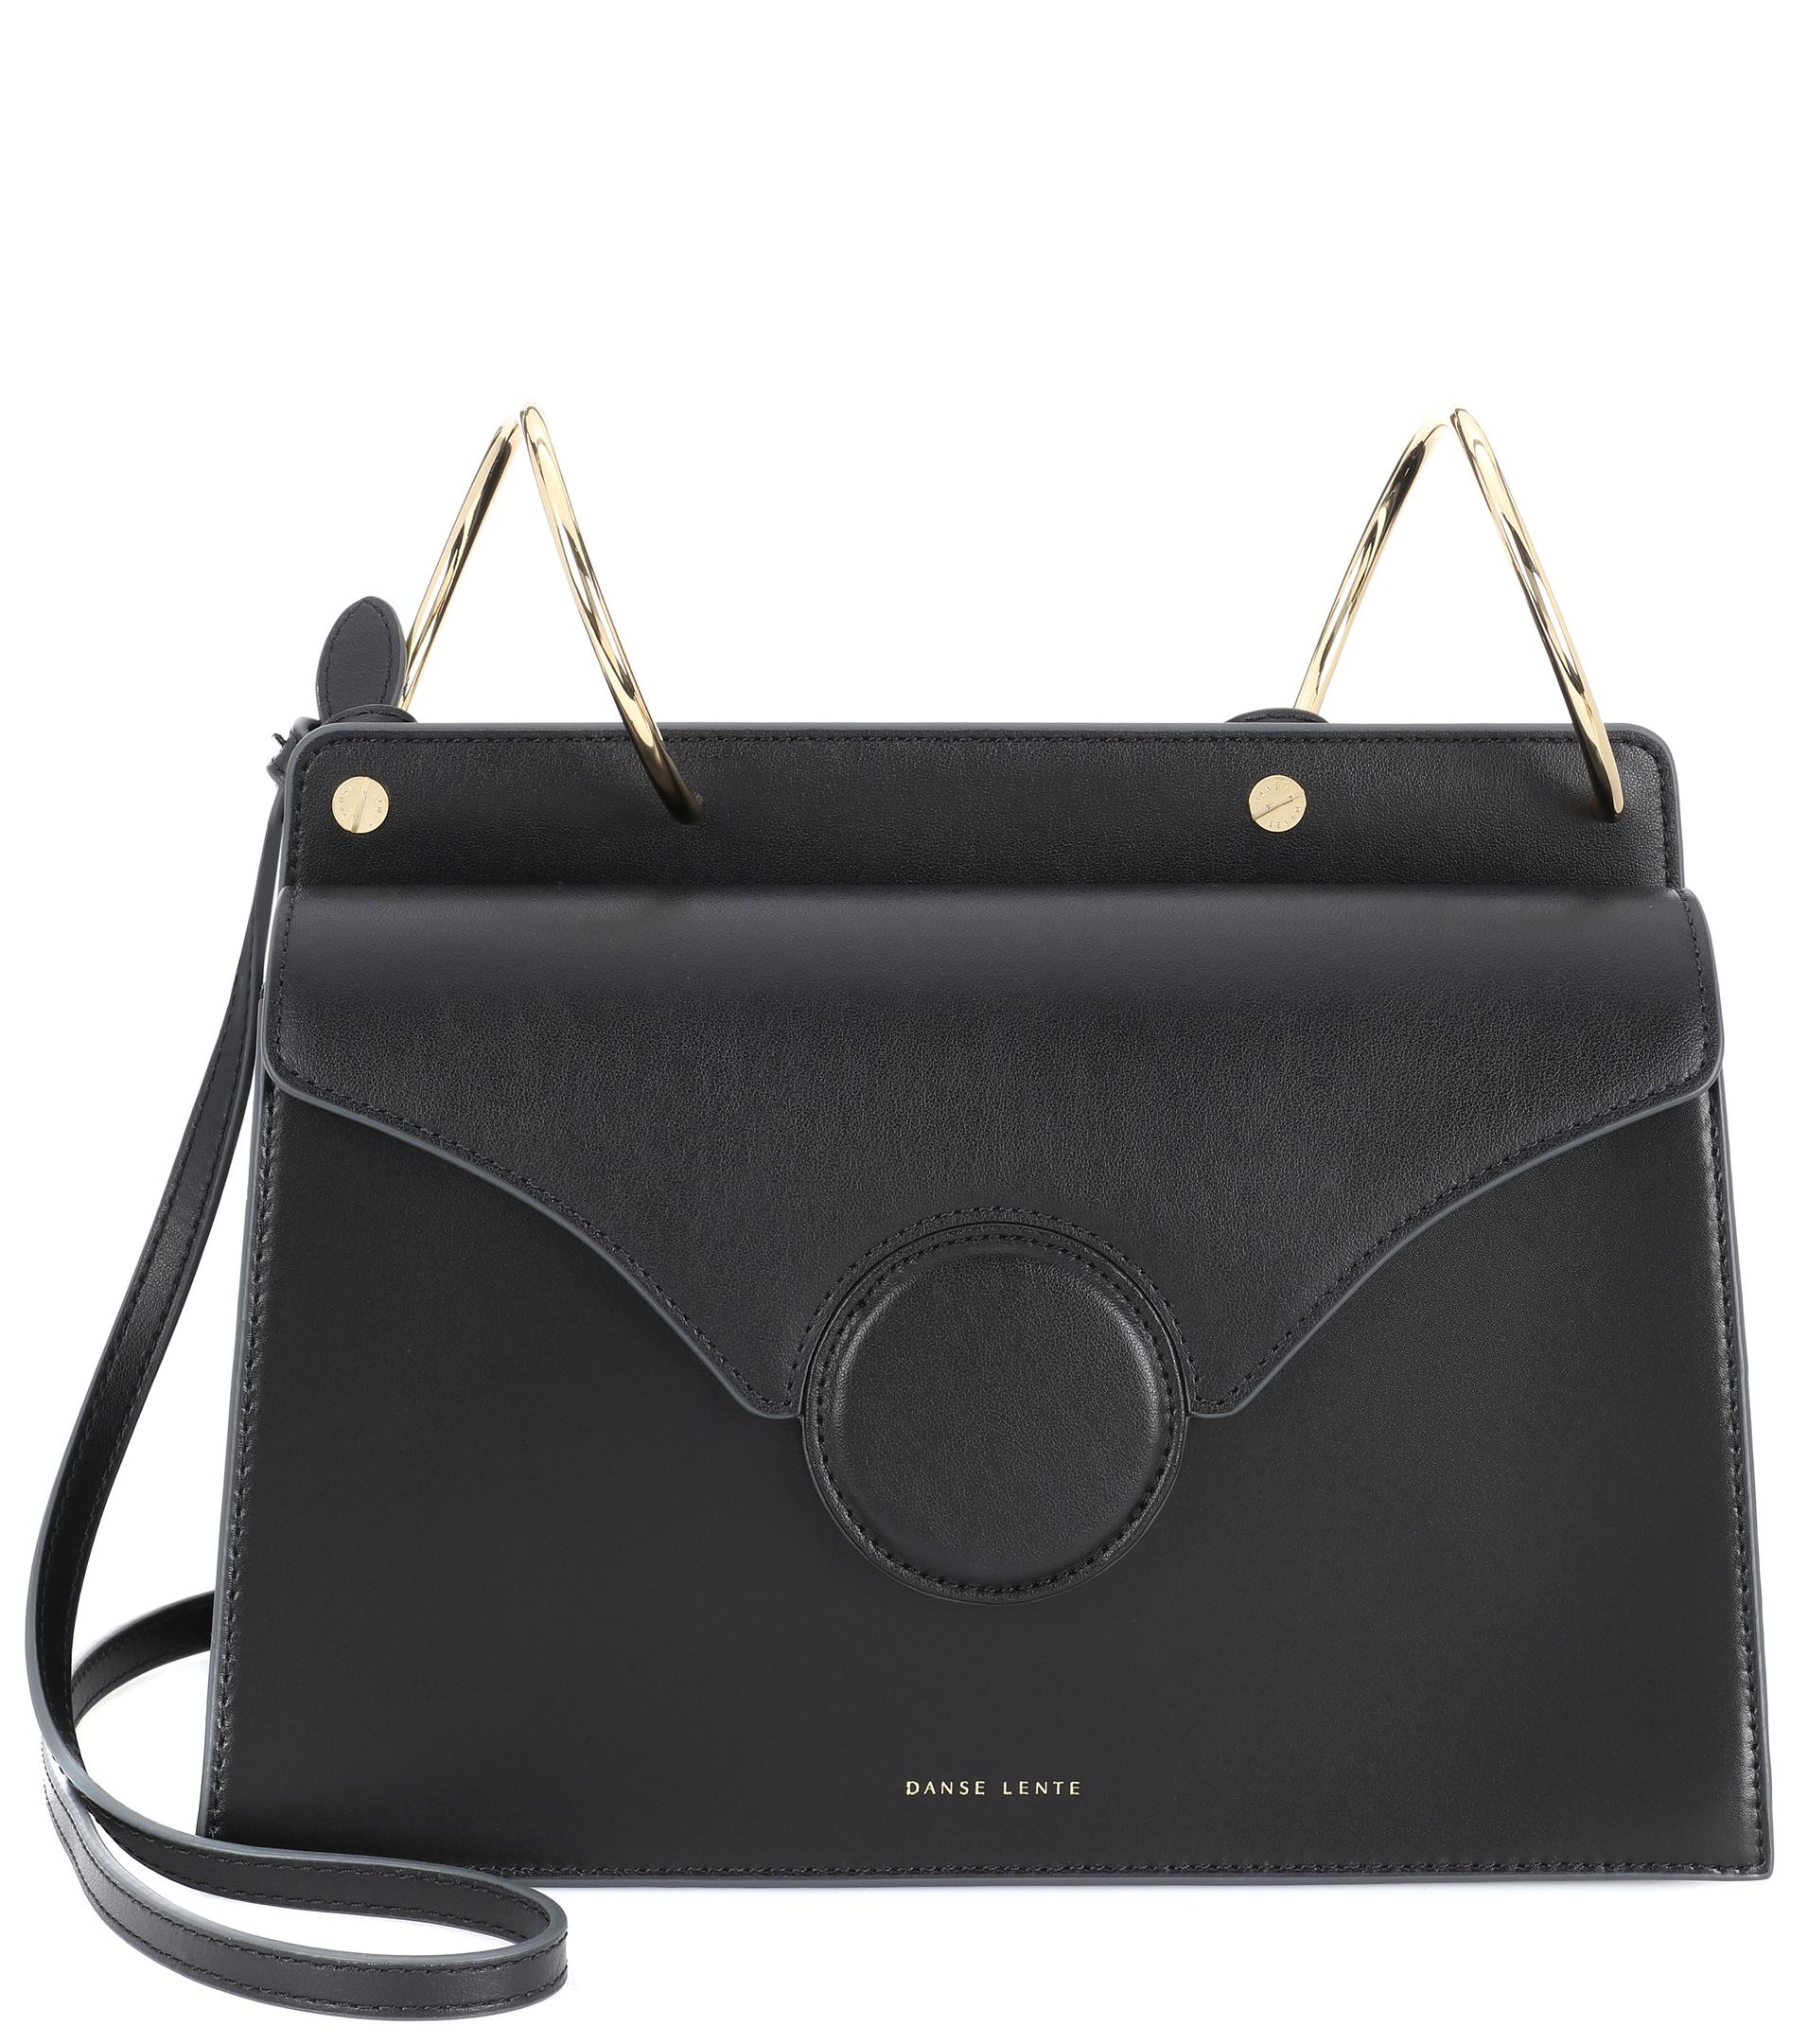 039015182d Phoebe Leather Shoulder Bag – Lyst. View fullscreen